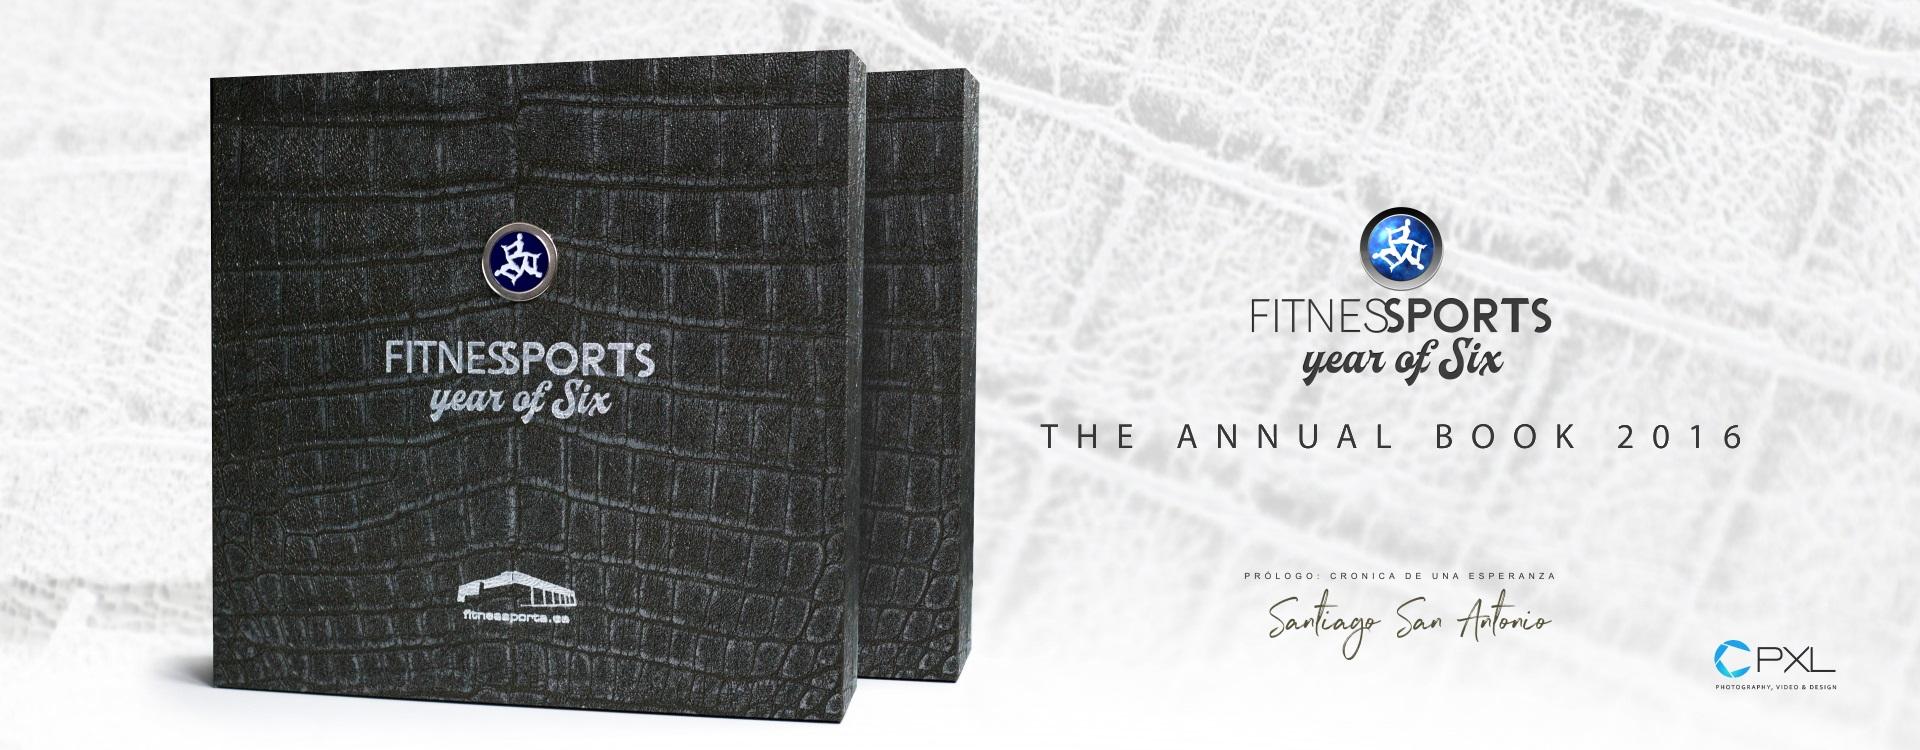 Anuario Year of six